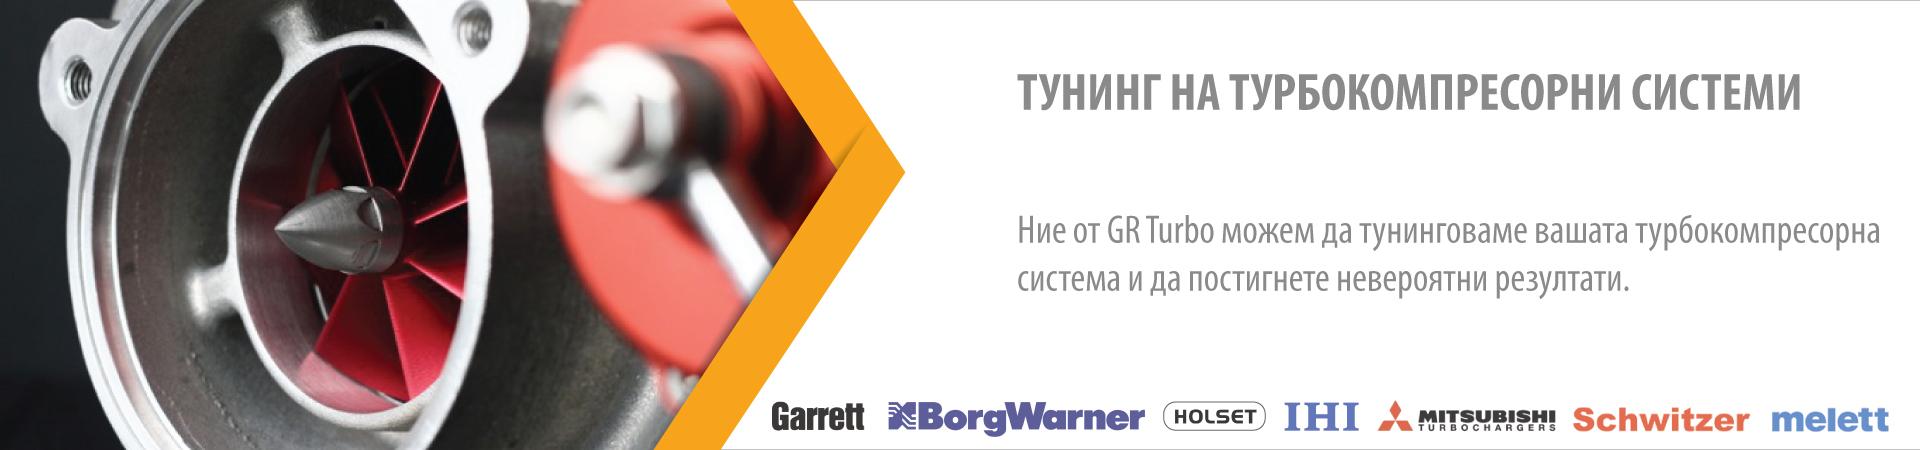 Ние от GR Turbo можем да тунинговаме вашата турбокомпресорна система и да постигнете невъобразими резултати.